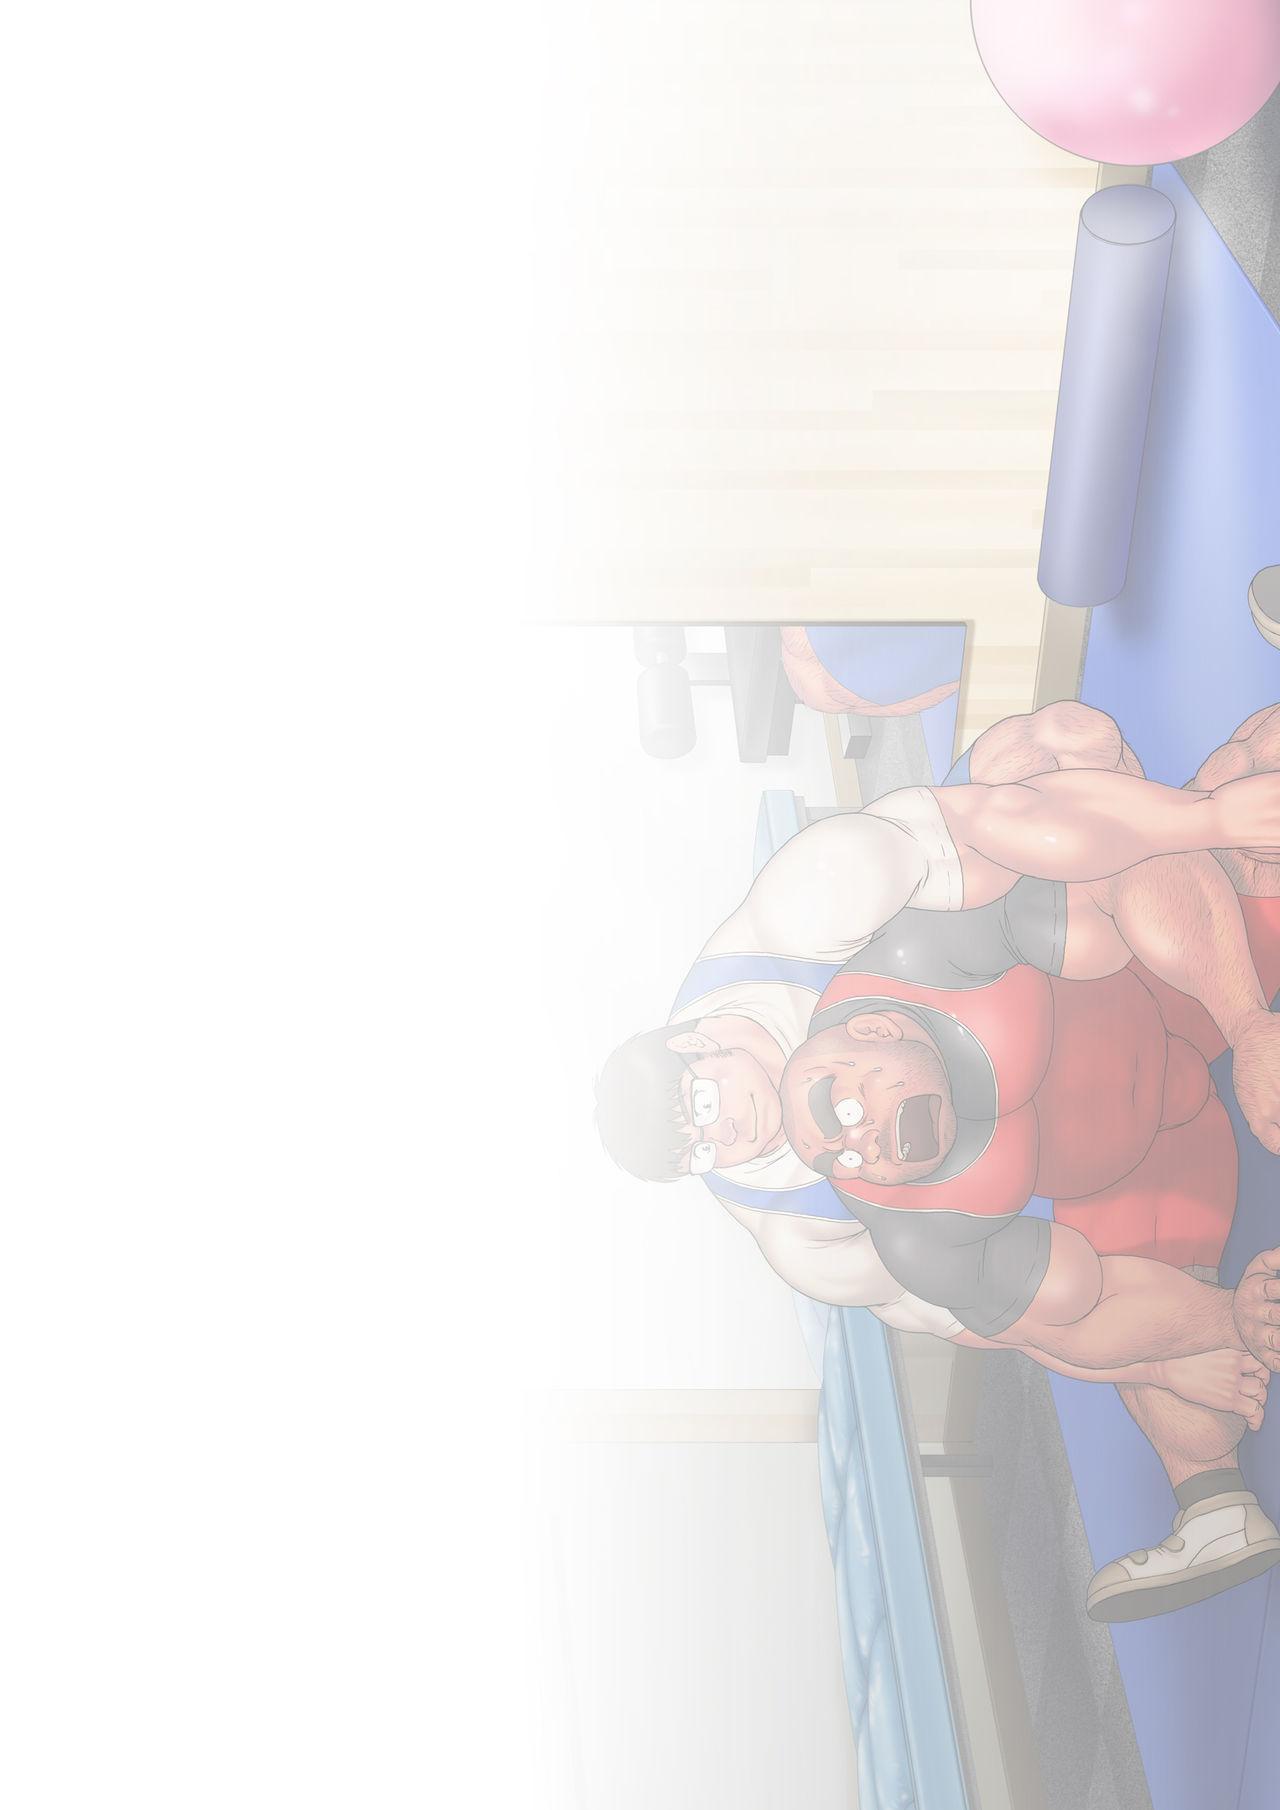 Danshi Koukousei Weightlifter Shiai-chuu, Osae kirenai Wakai Takeri 1